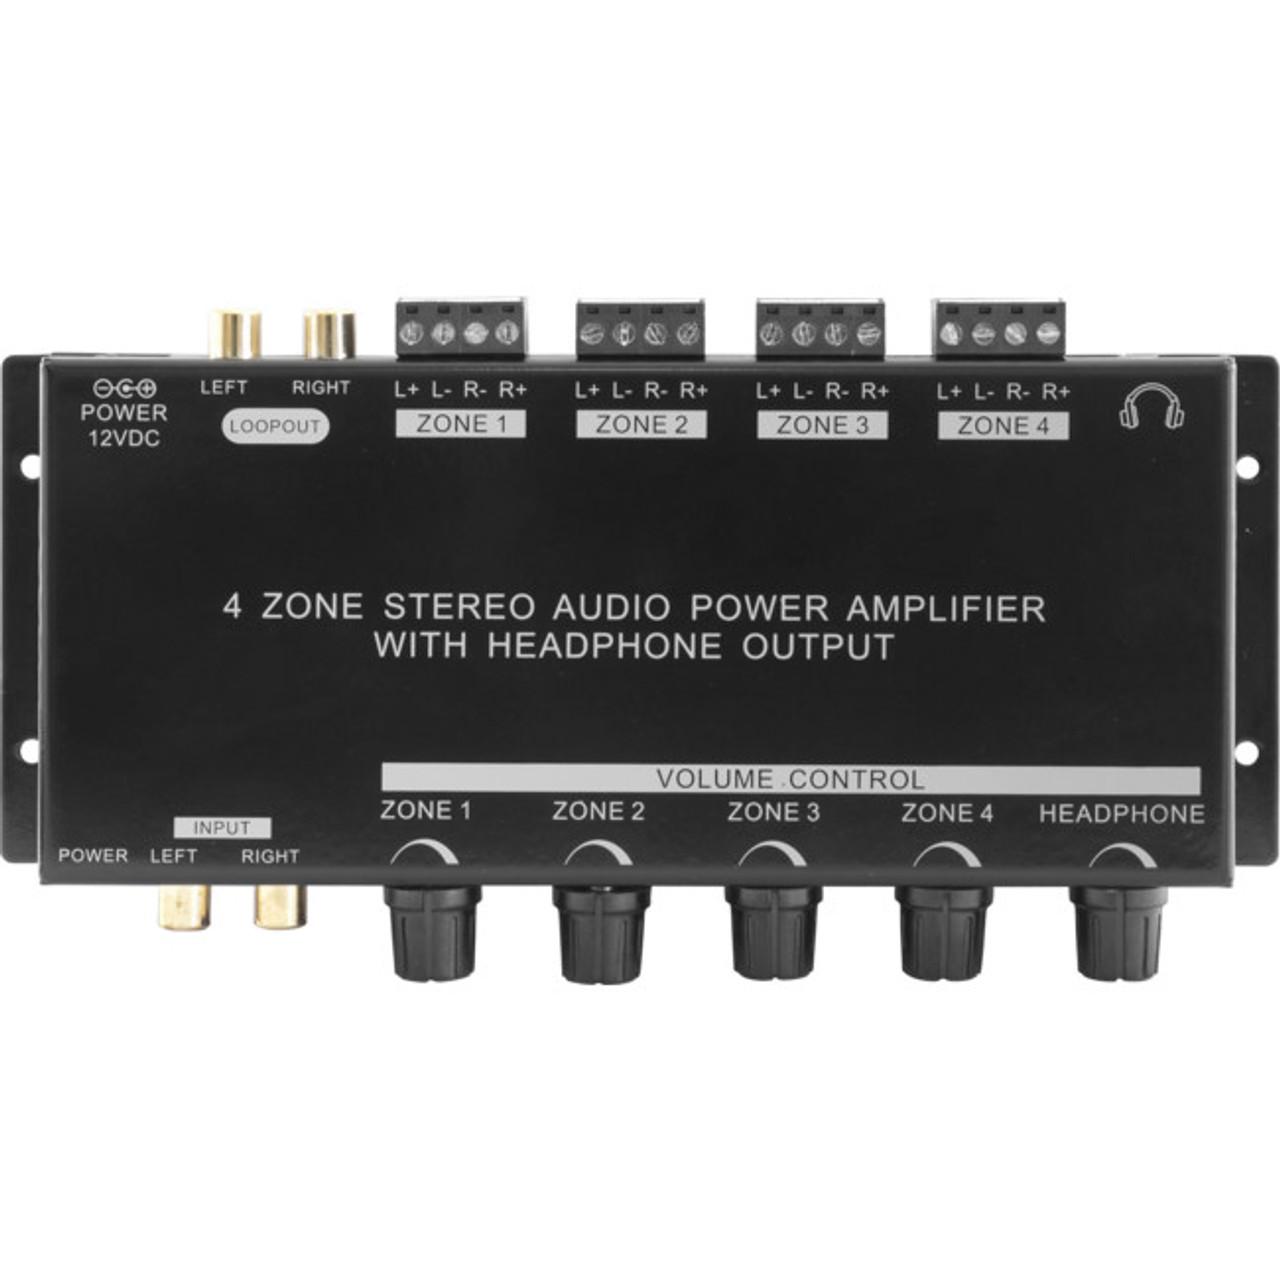 Pro2 PRO1300 Four Zone Stereo Power Amplifier